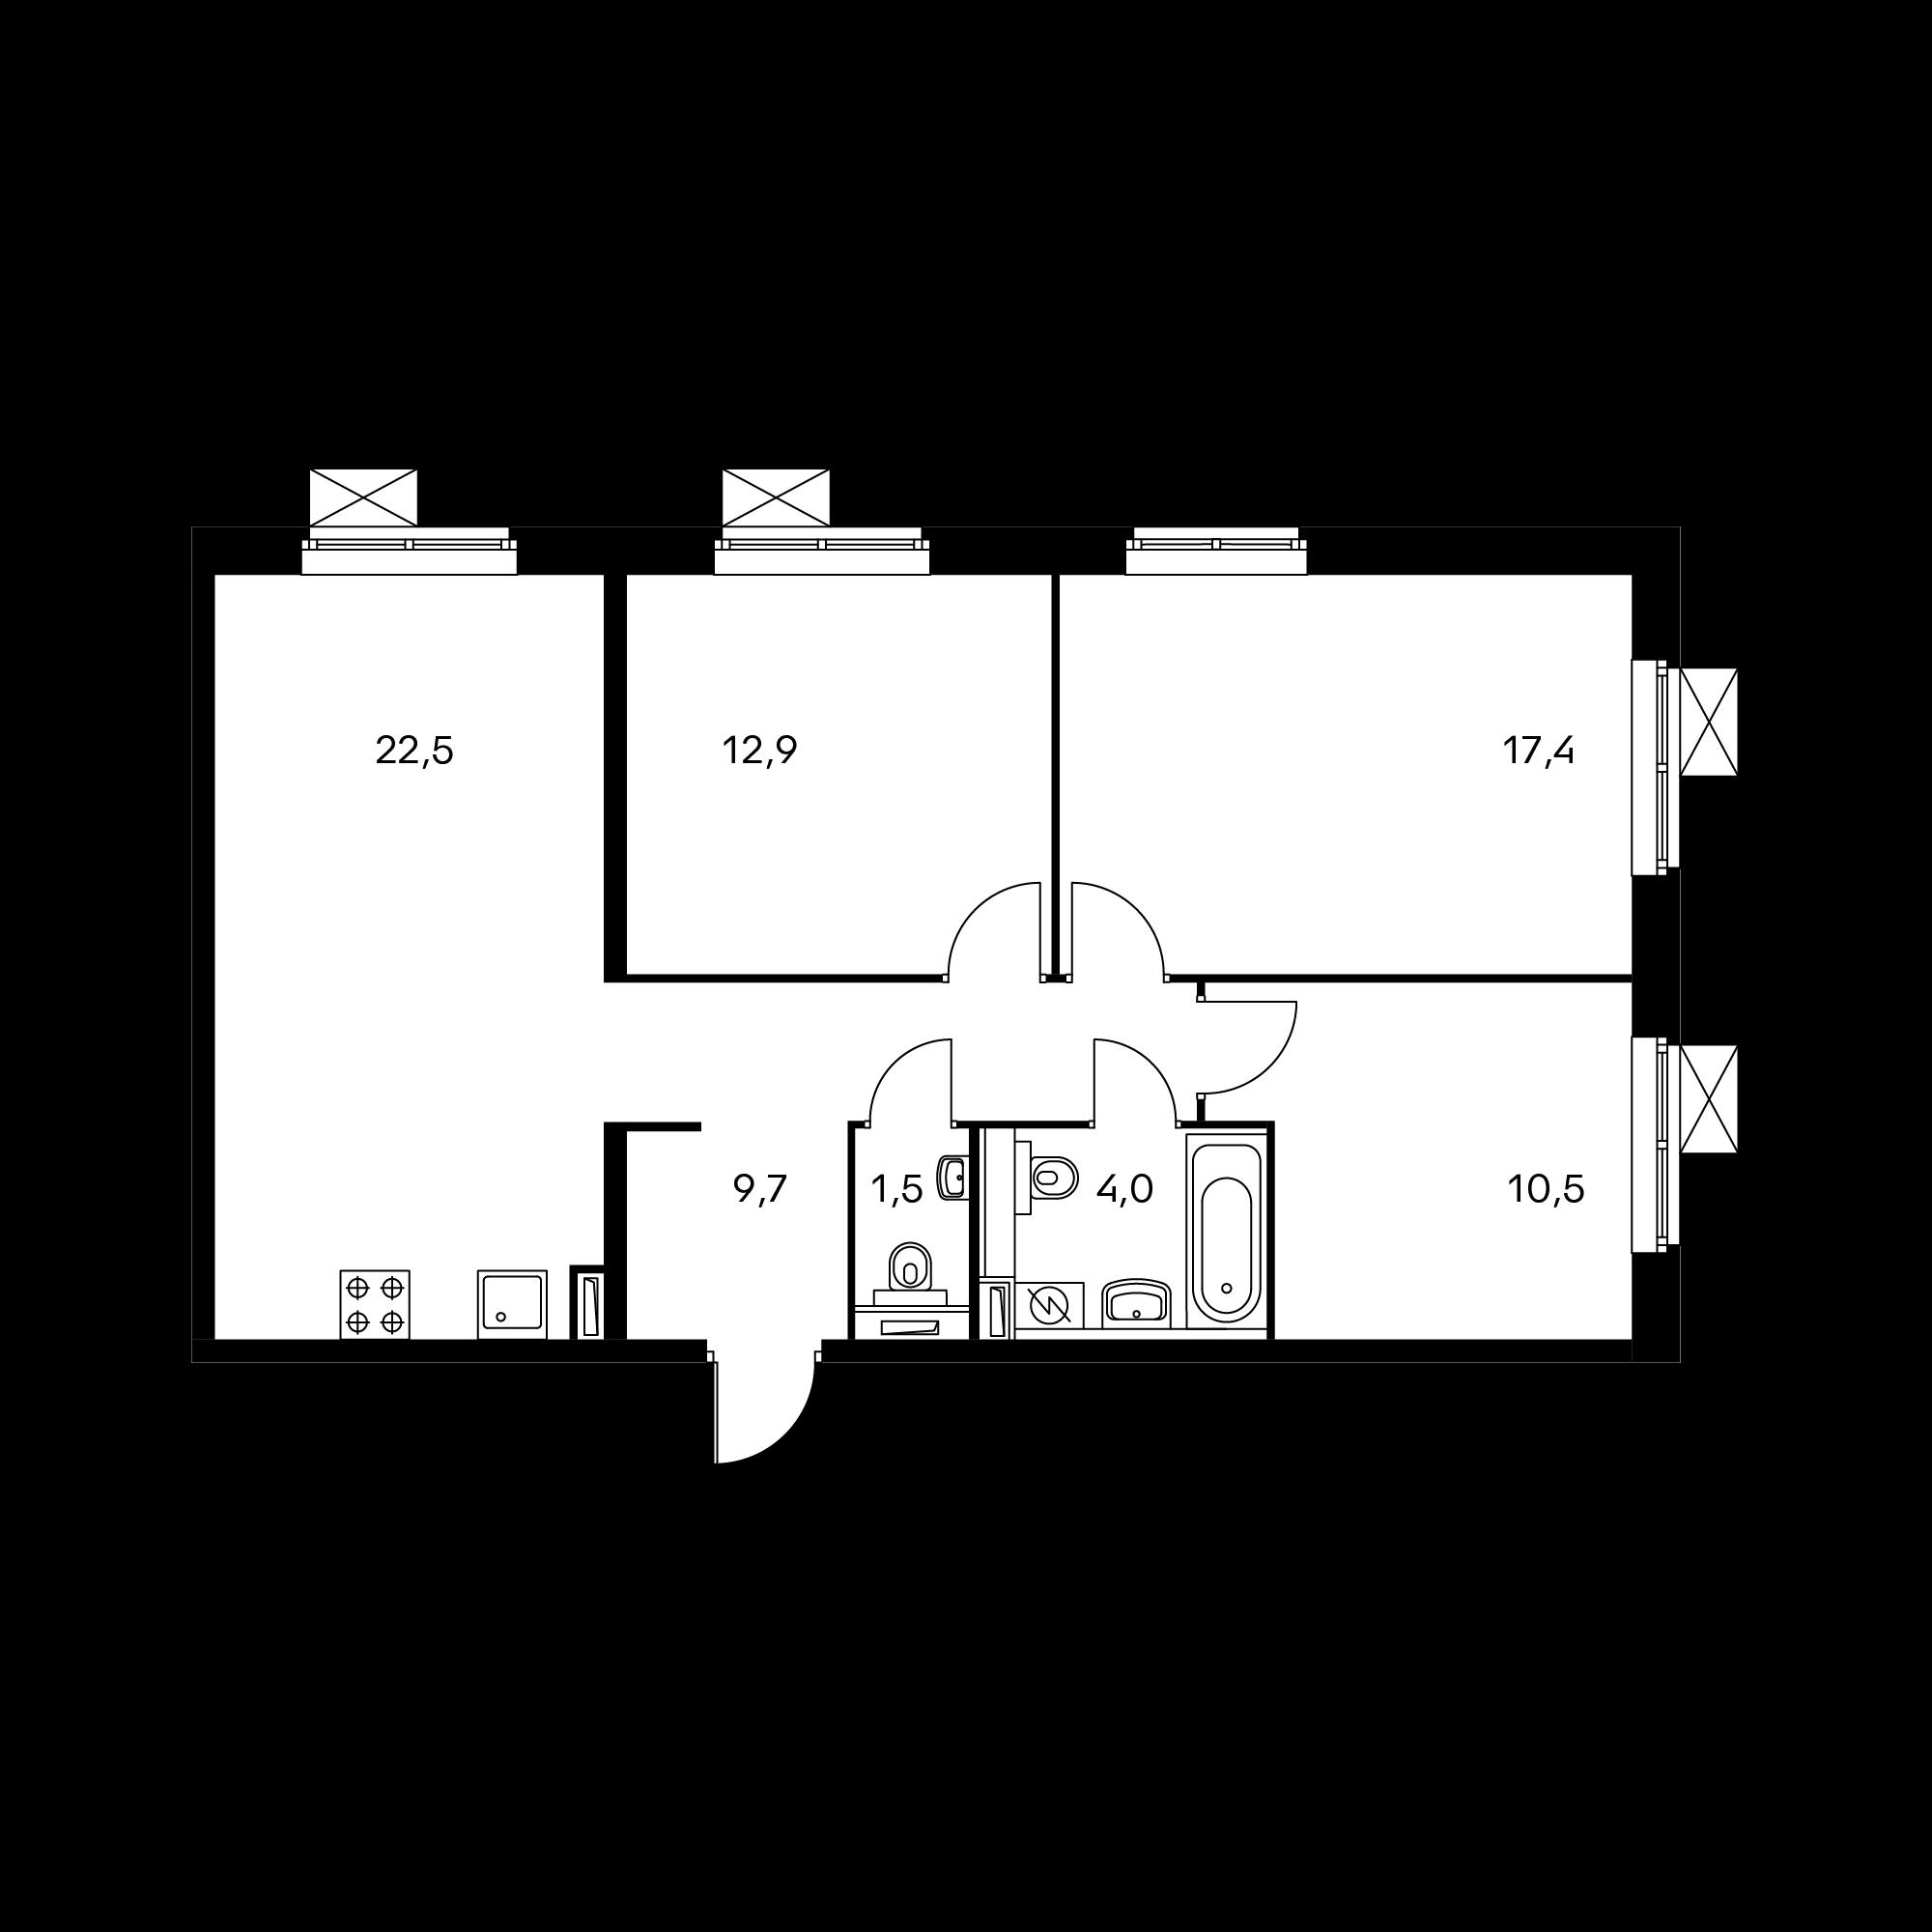 3EM21_6.9-2